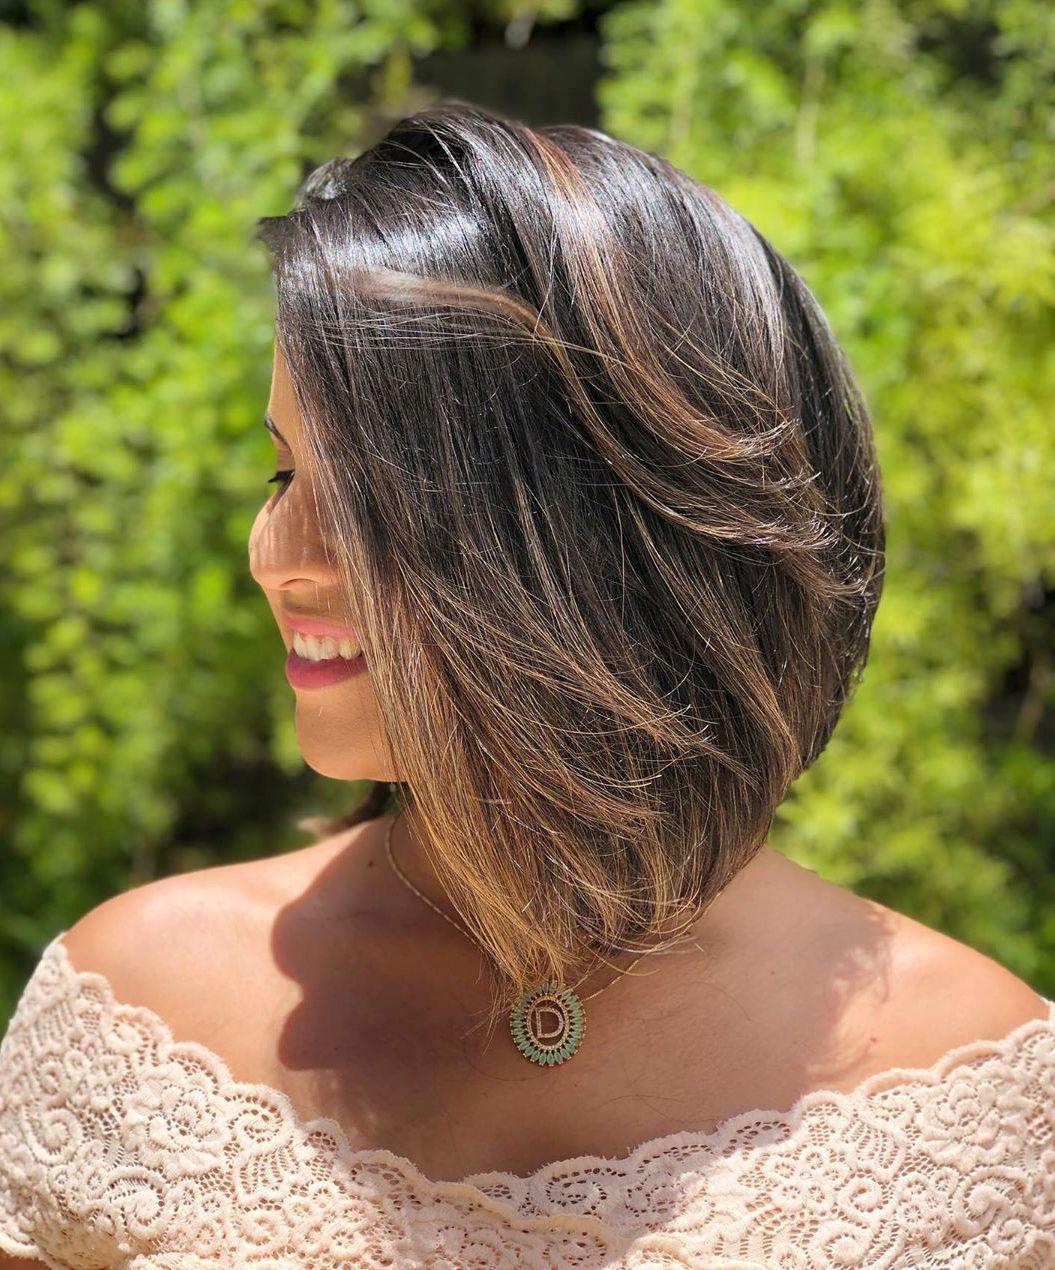 Lob Haircut with Layers and Balayage Highlights